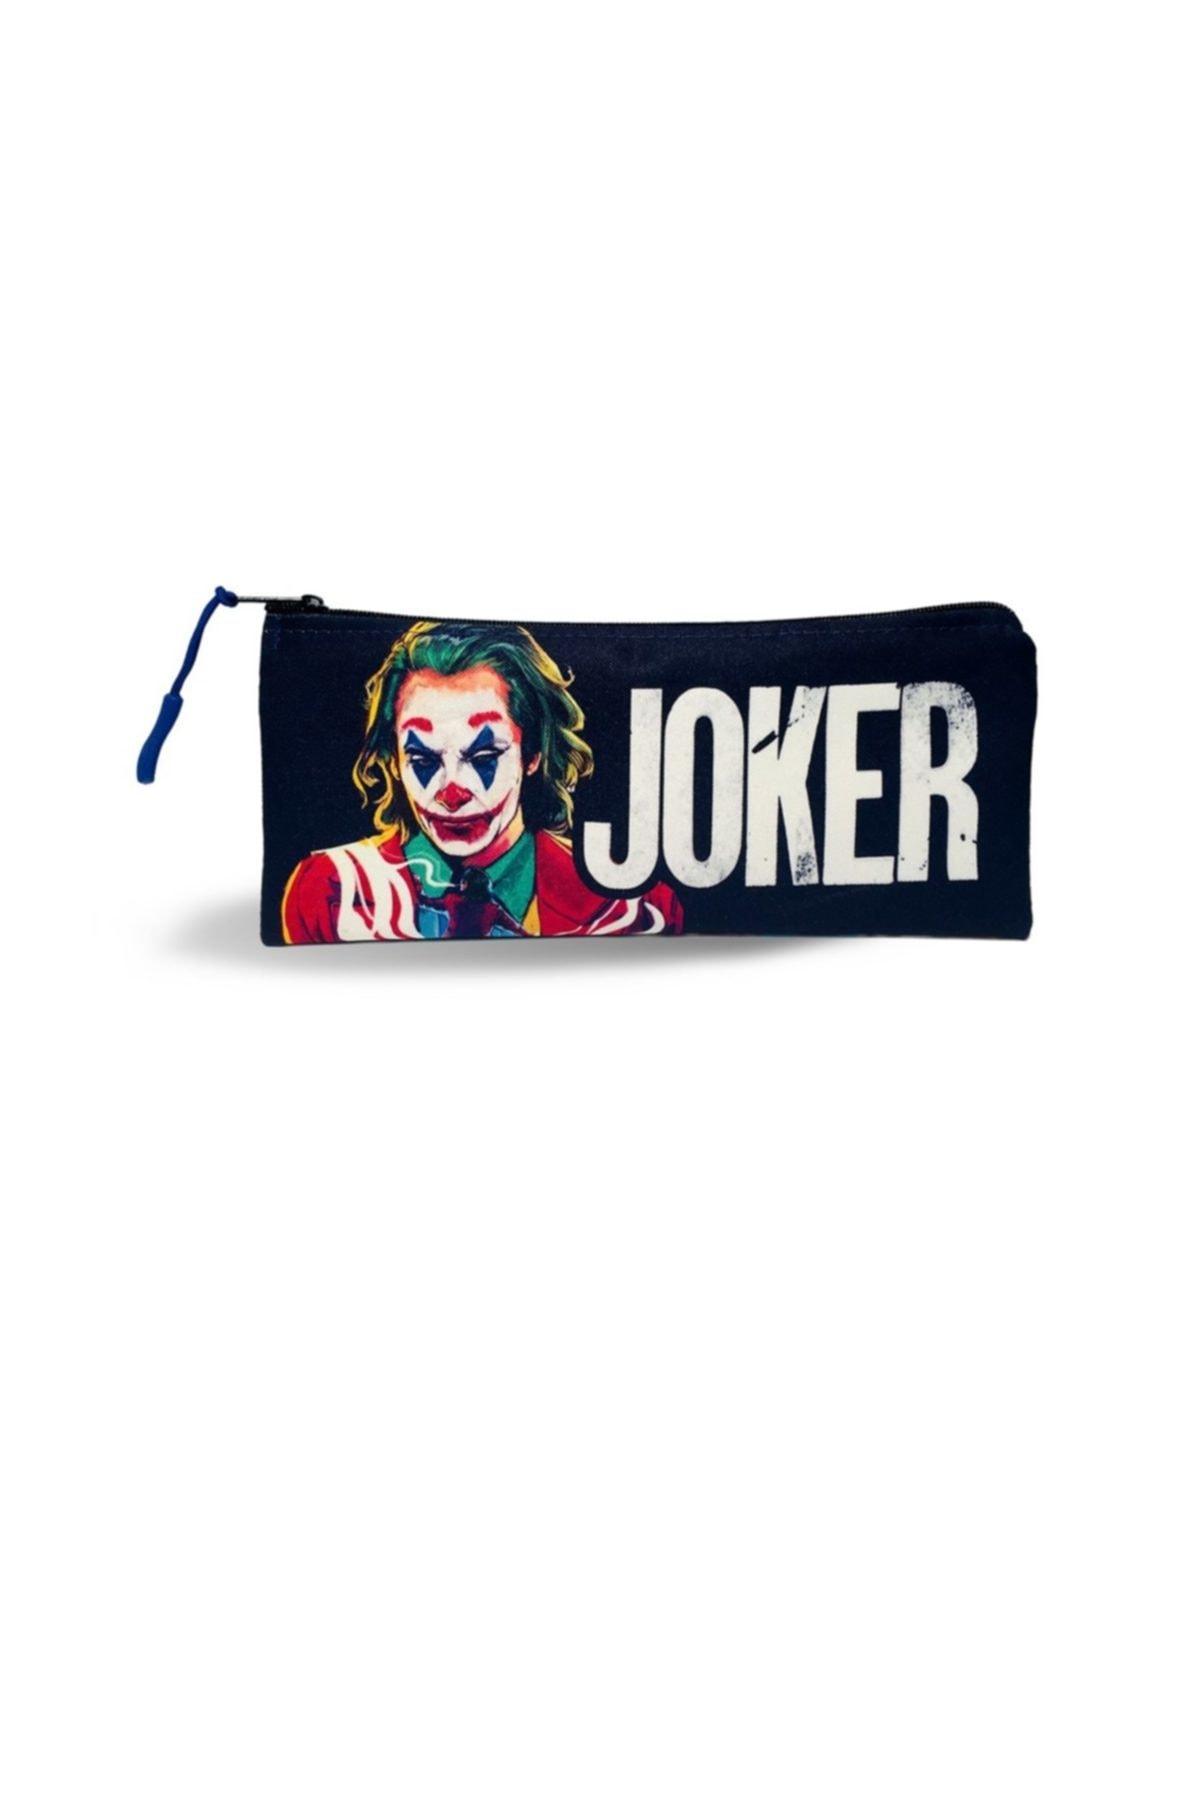 2021 New Fashion Joker Design Cloth Pencil Bag - Pencil Holder Sport Stylish Cute Design Wonder Free and Fast Shipping